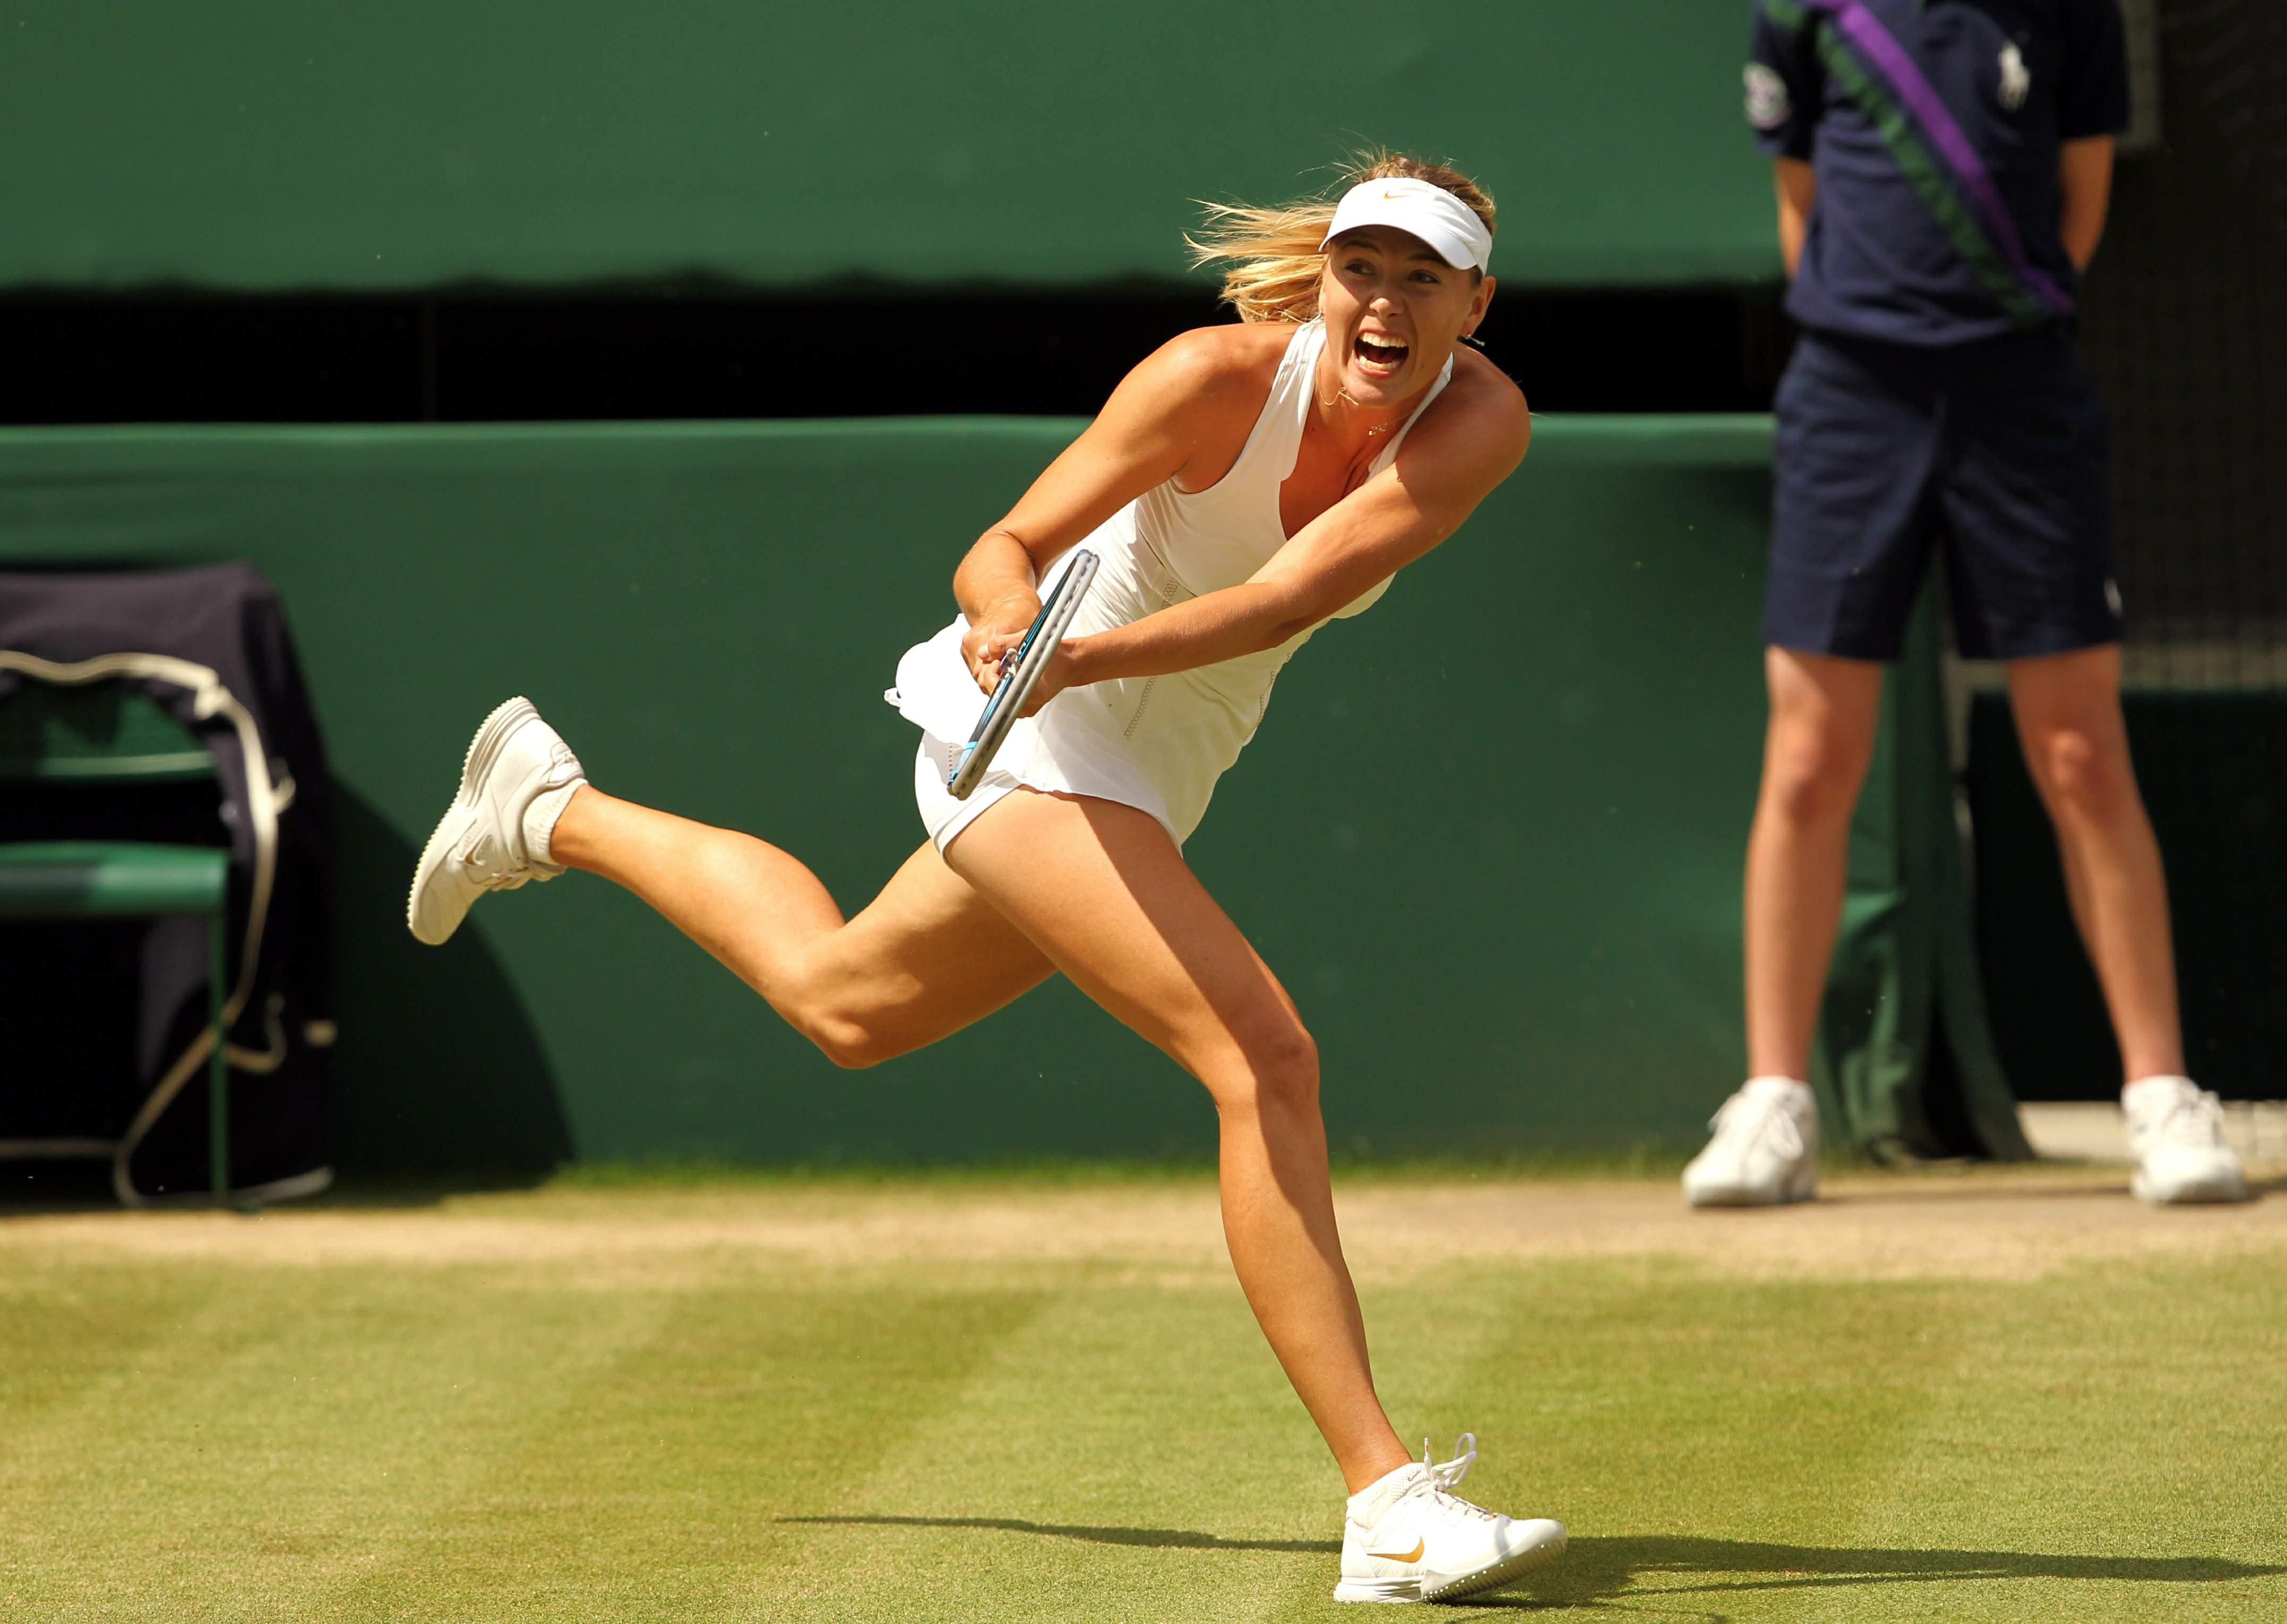 Maria sharapova photos wimbledon 2018 Wimbledon 2018: Maria Sharapova returns to London but is at a